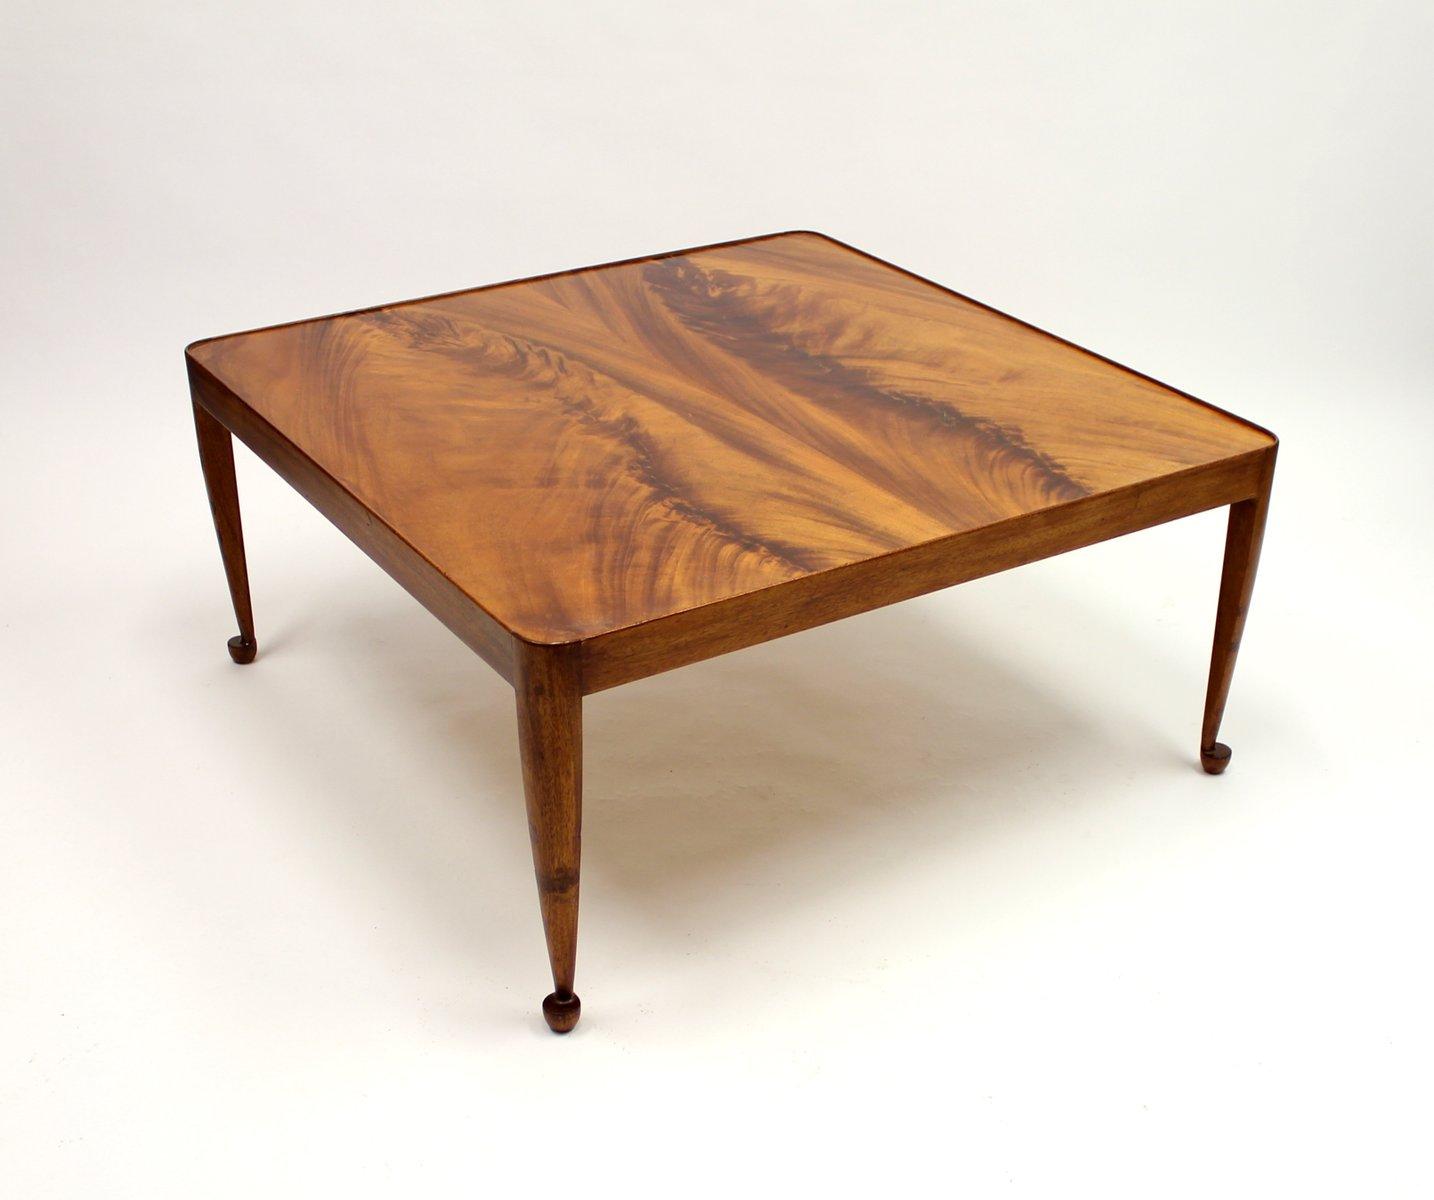 alanda square coffee table by paolo piva for bb italia